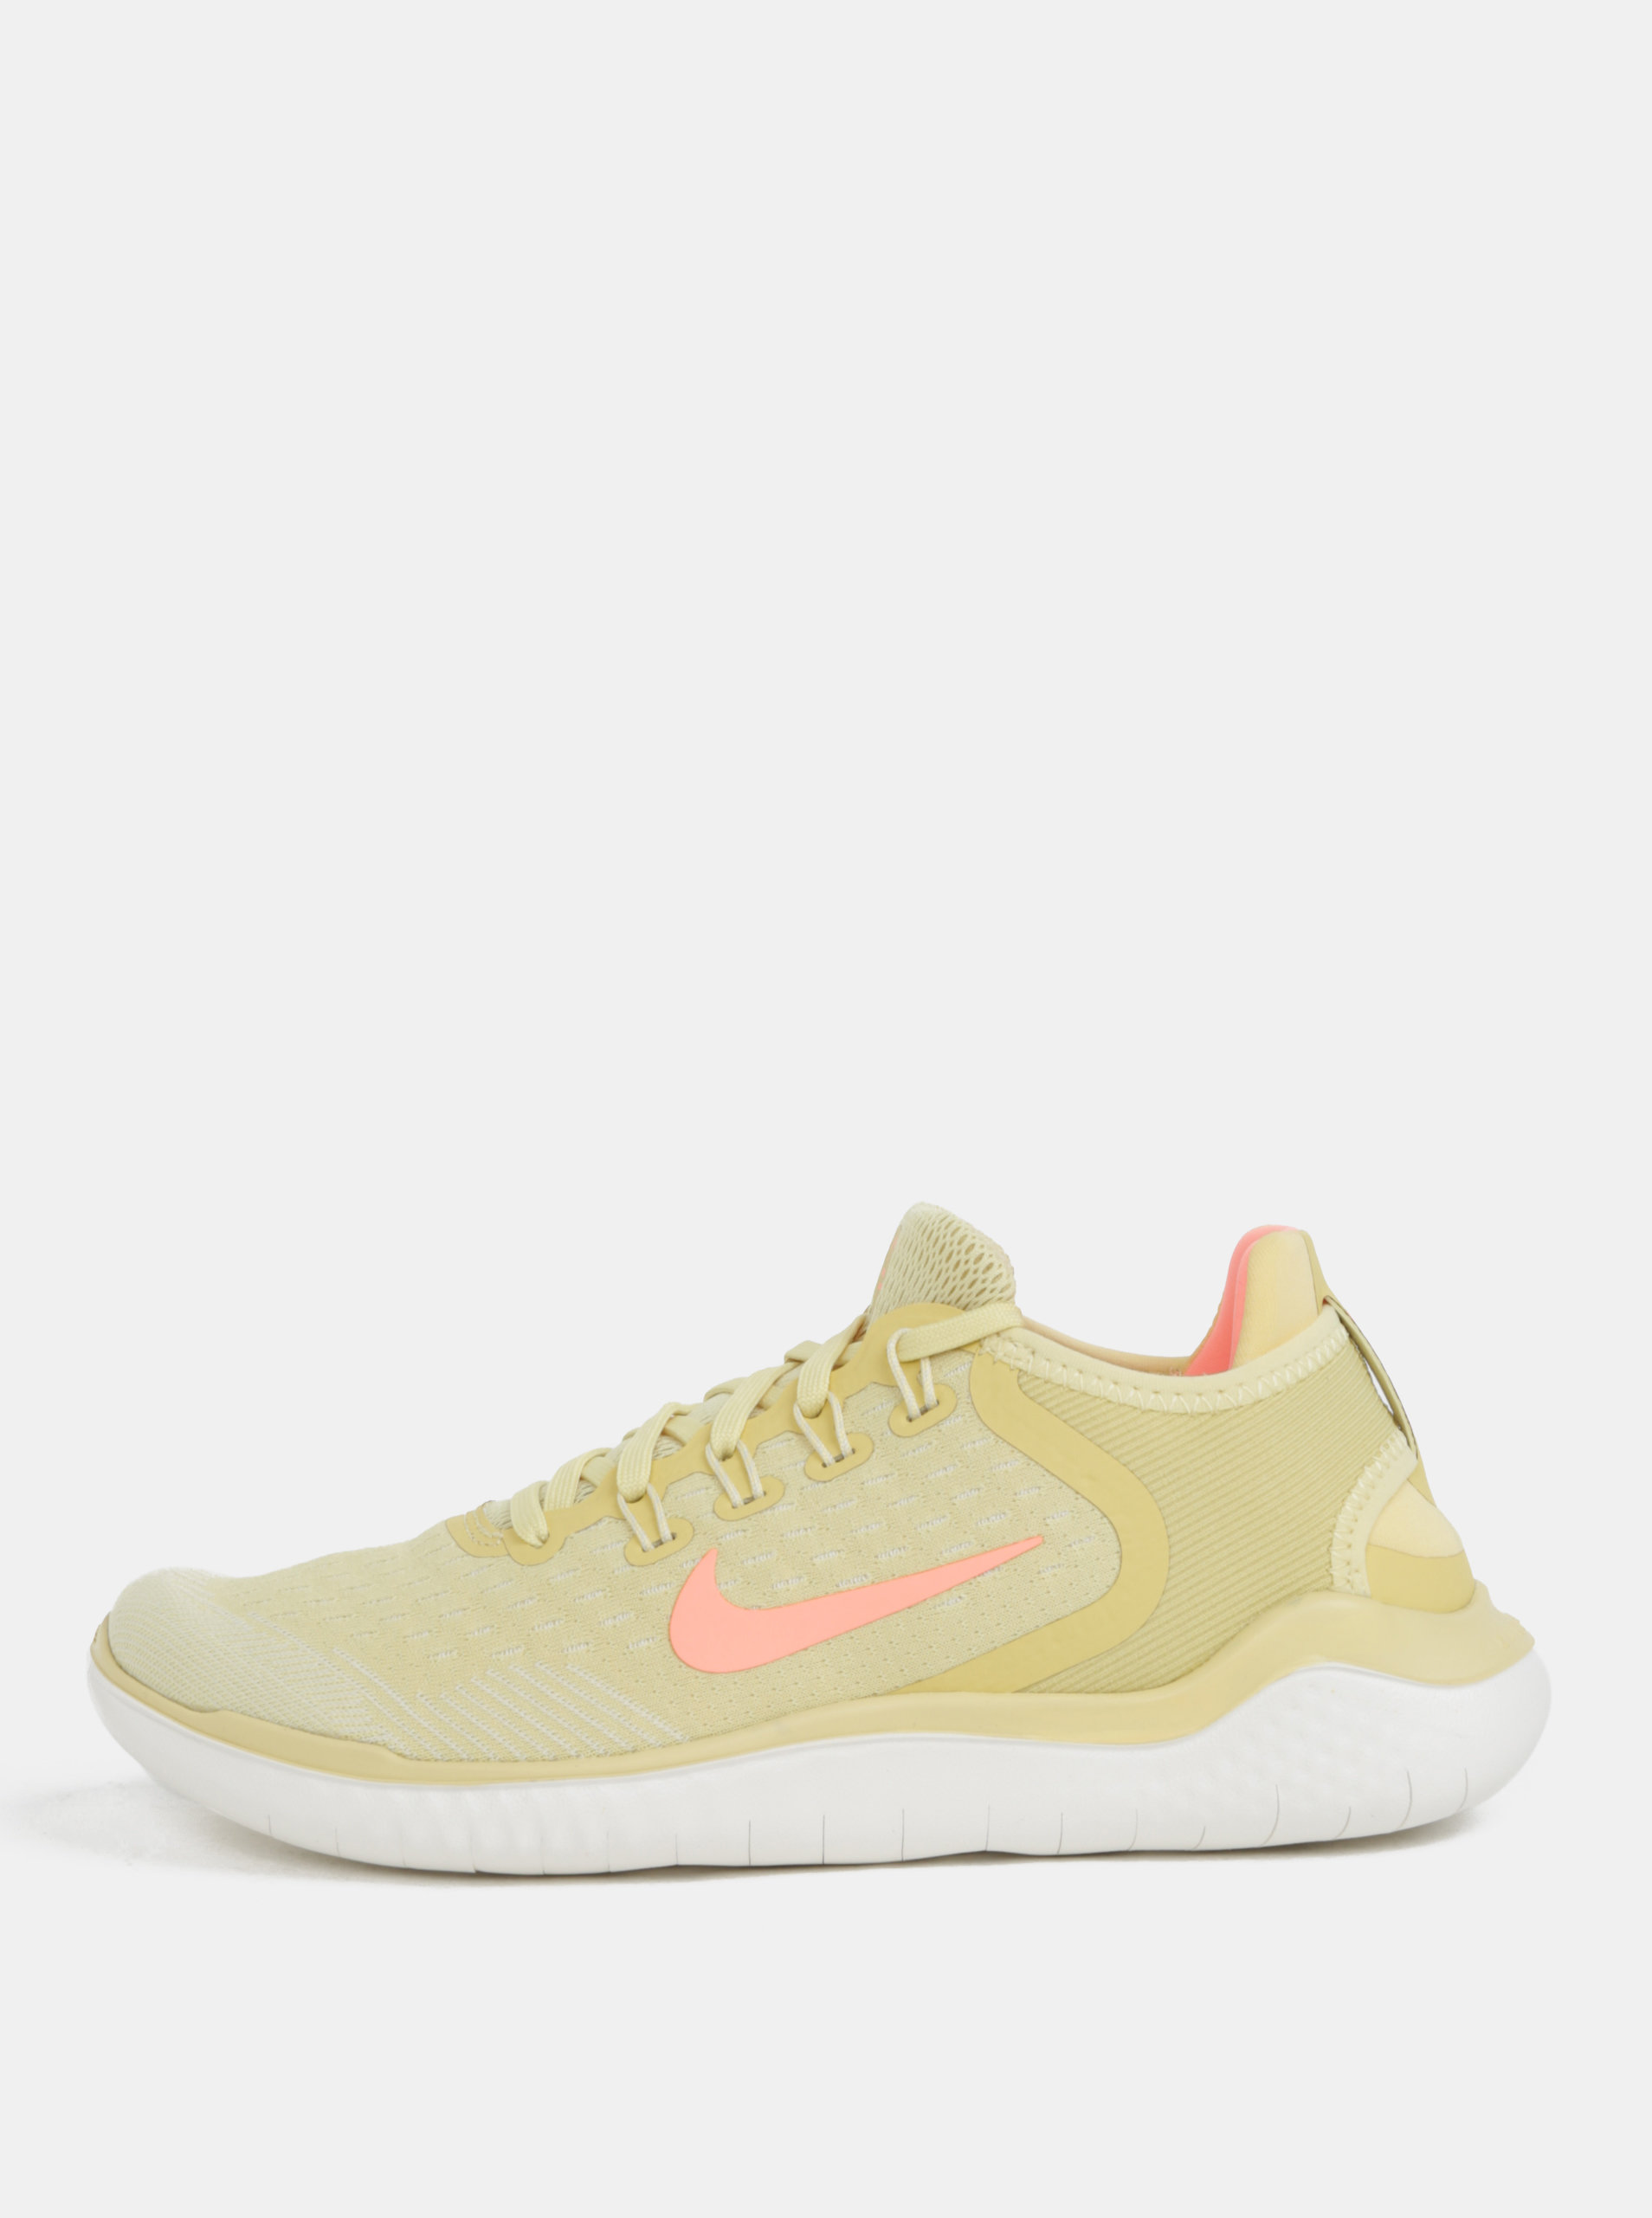 9f041bc7f3b9 Žlté dámské tenisky Nike Free run ...